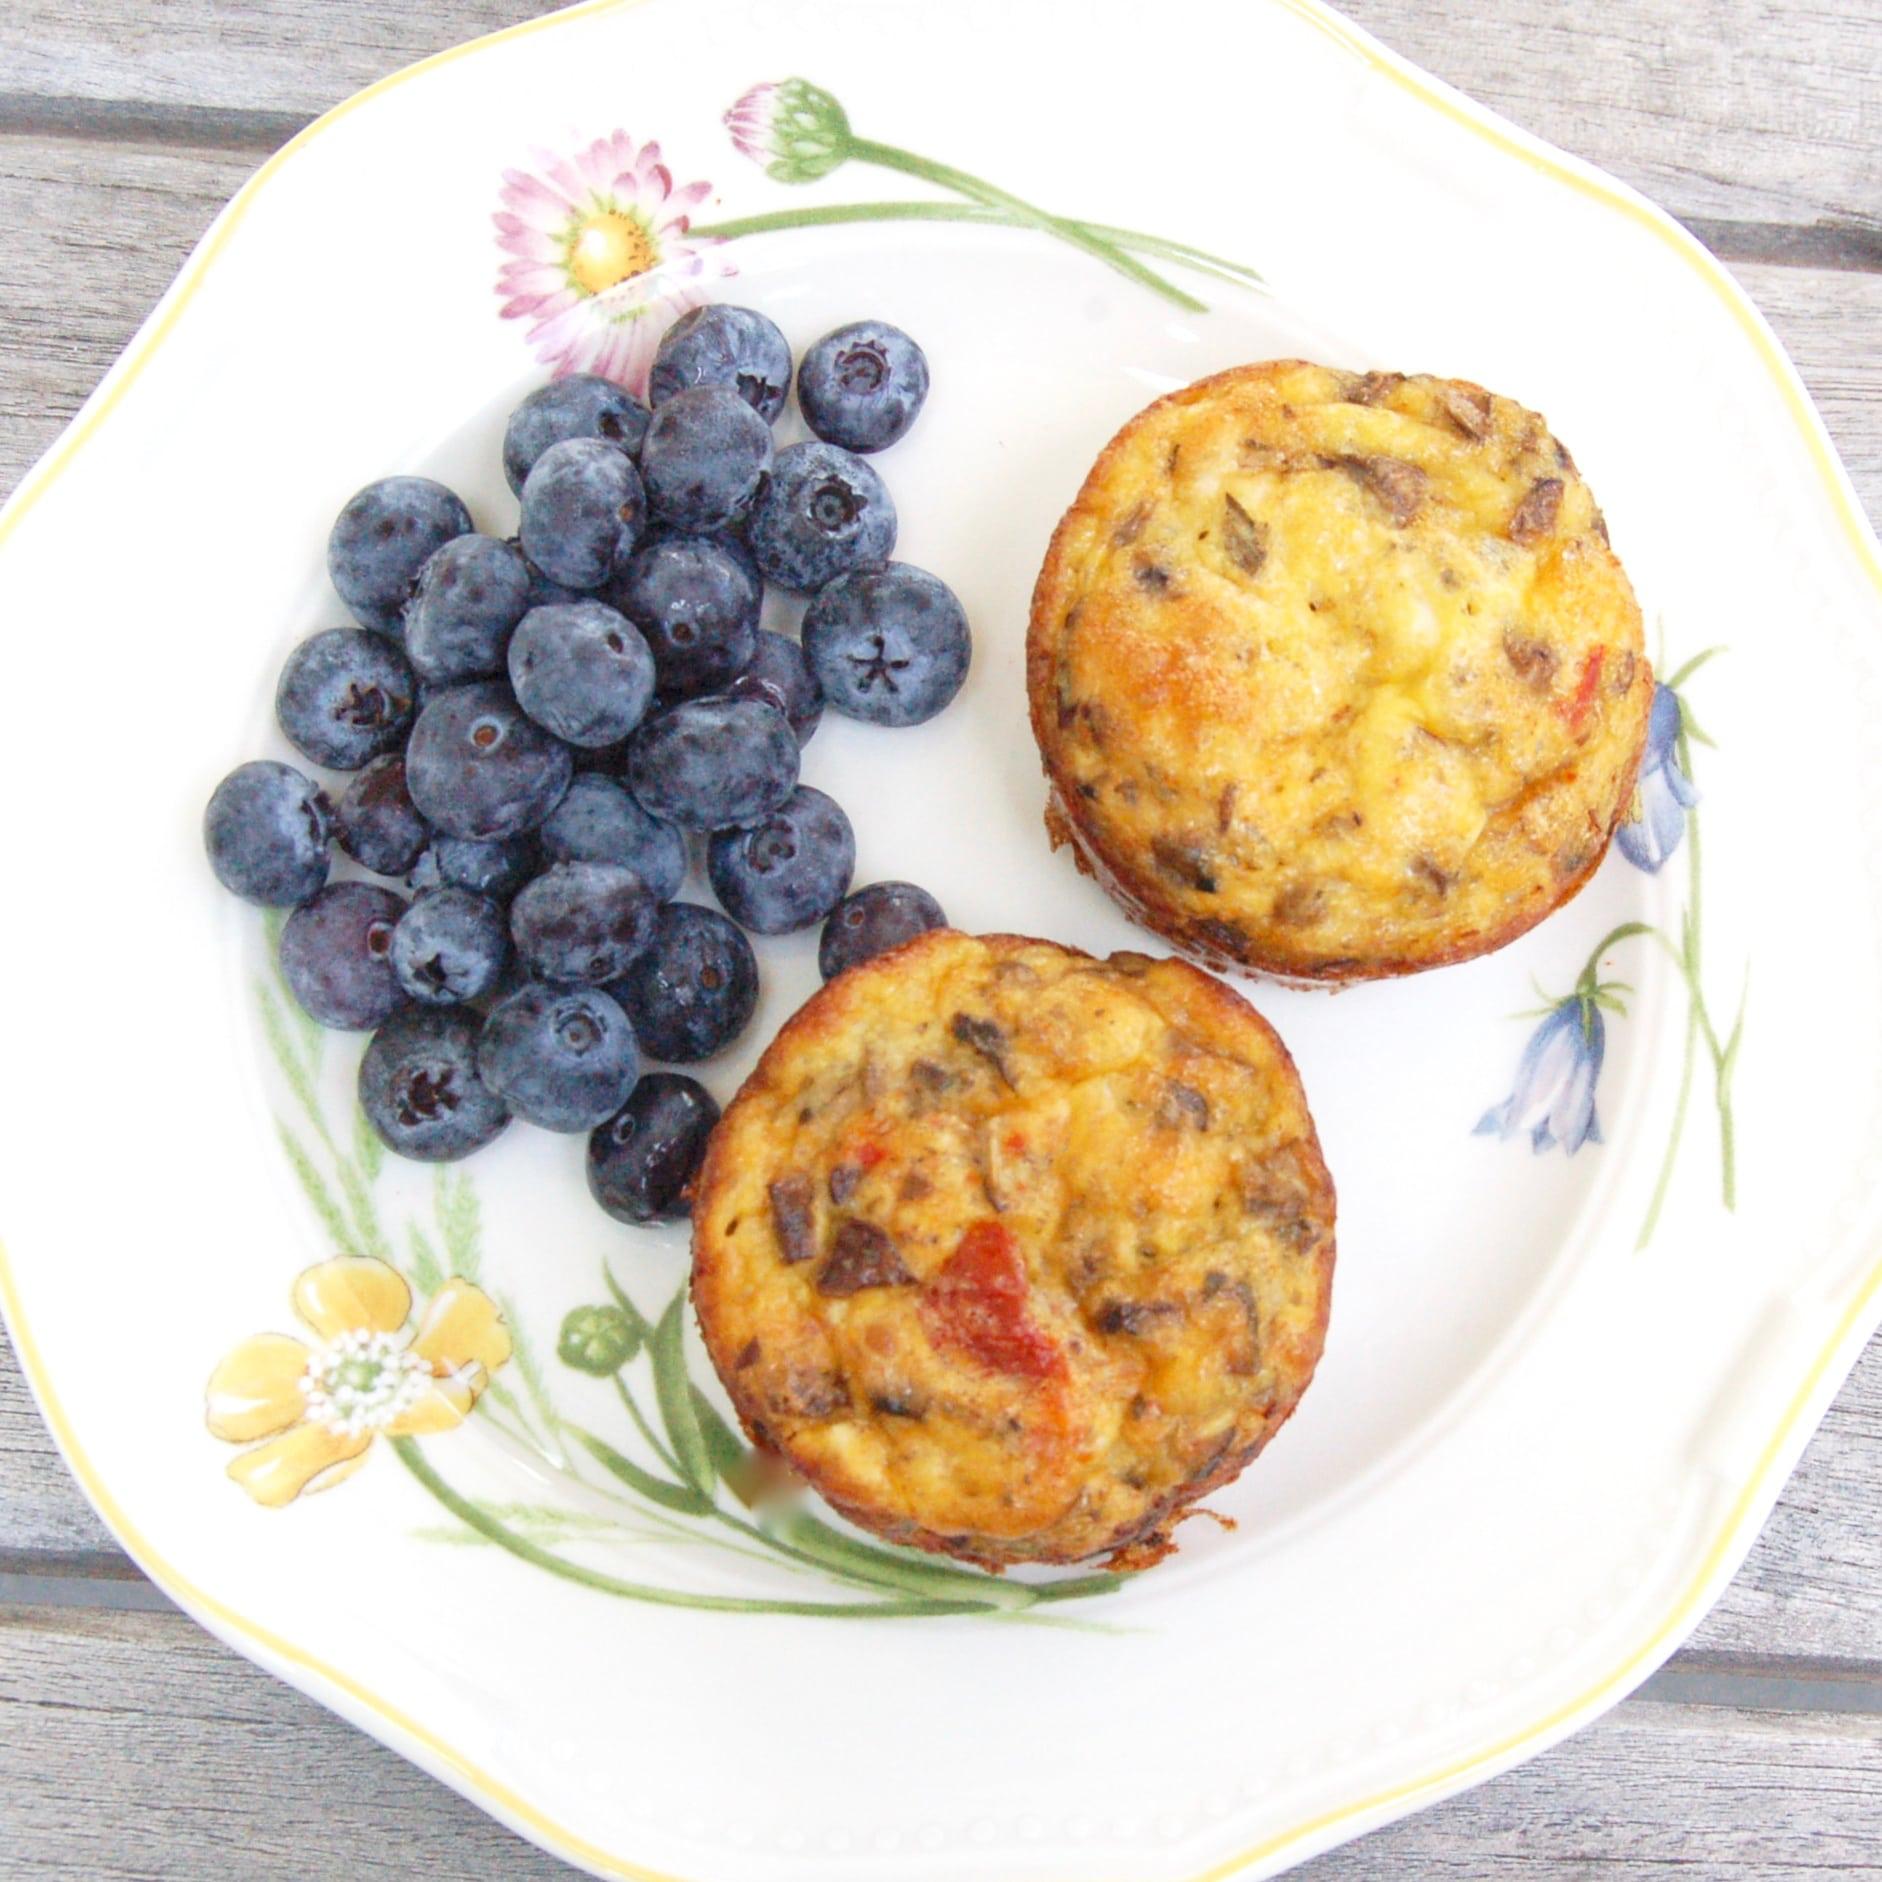 An Easy And Healthy Make-Ahead Breakfast